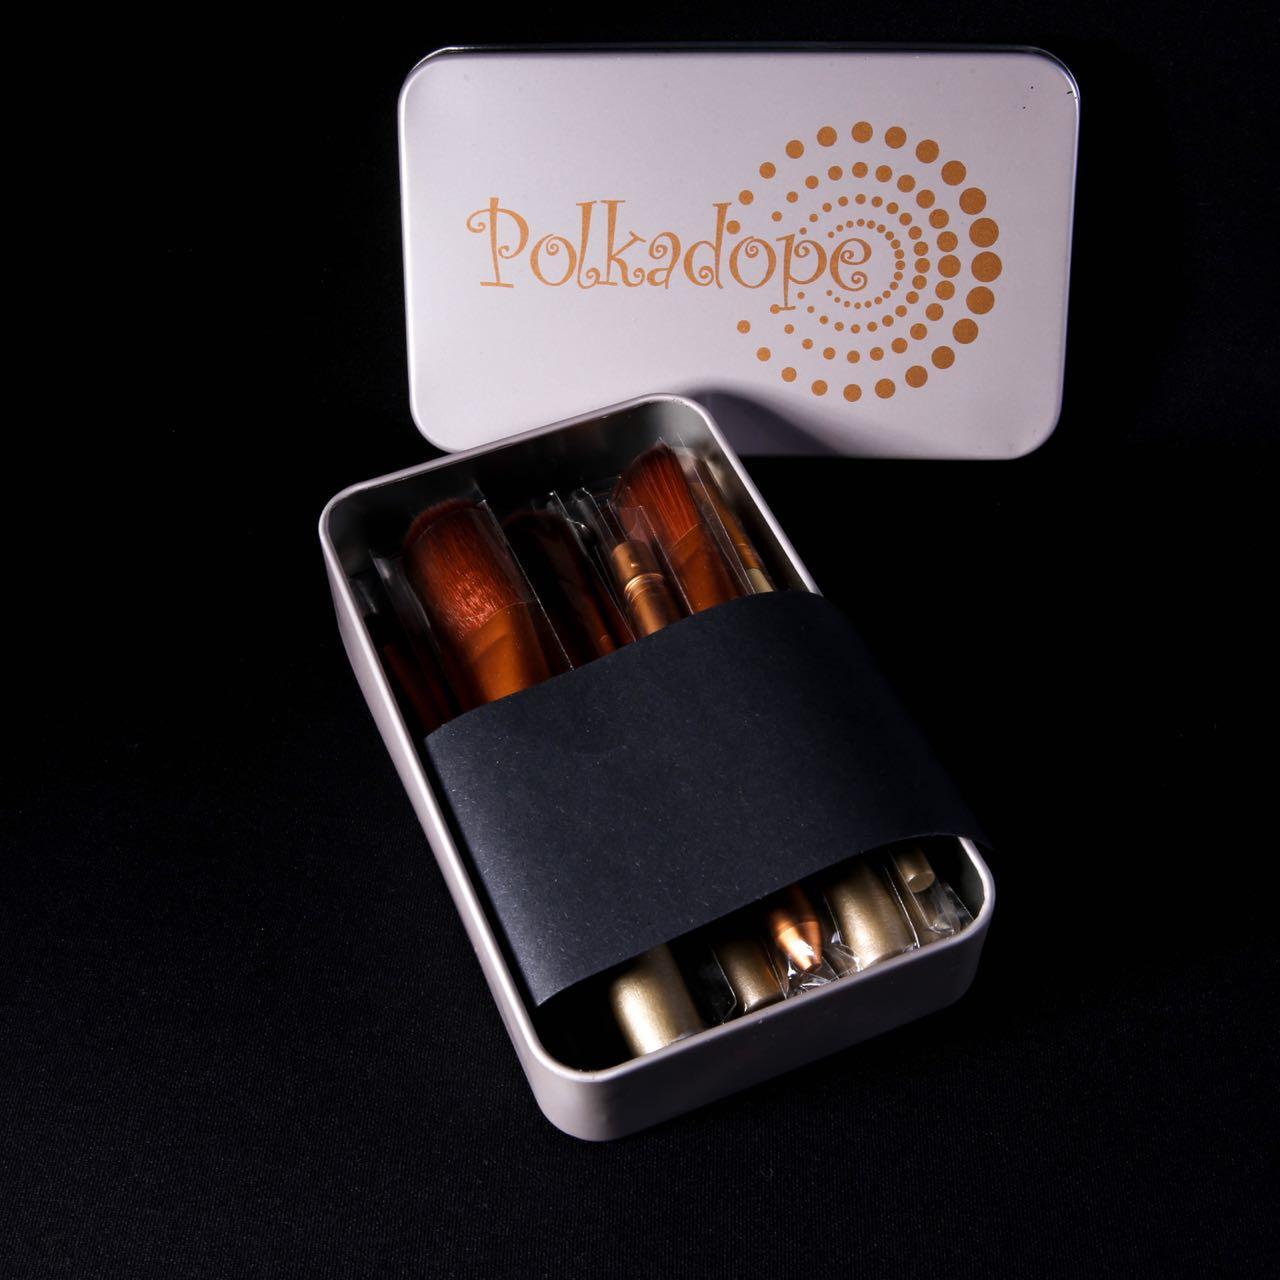 Lucky Kuas Makeup Set Isi 5 Pcs 1 Biru Produk Terbaik Wiki Harga Mac Brush 12 Make Up Polkadope